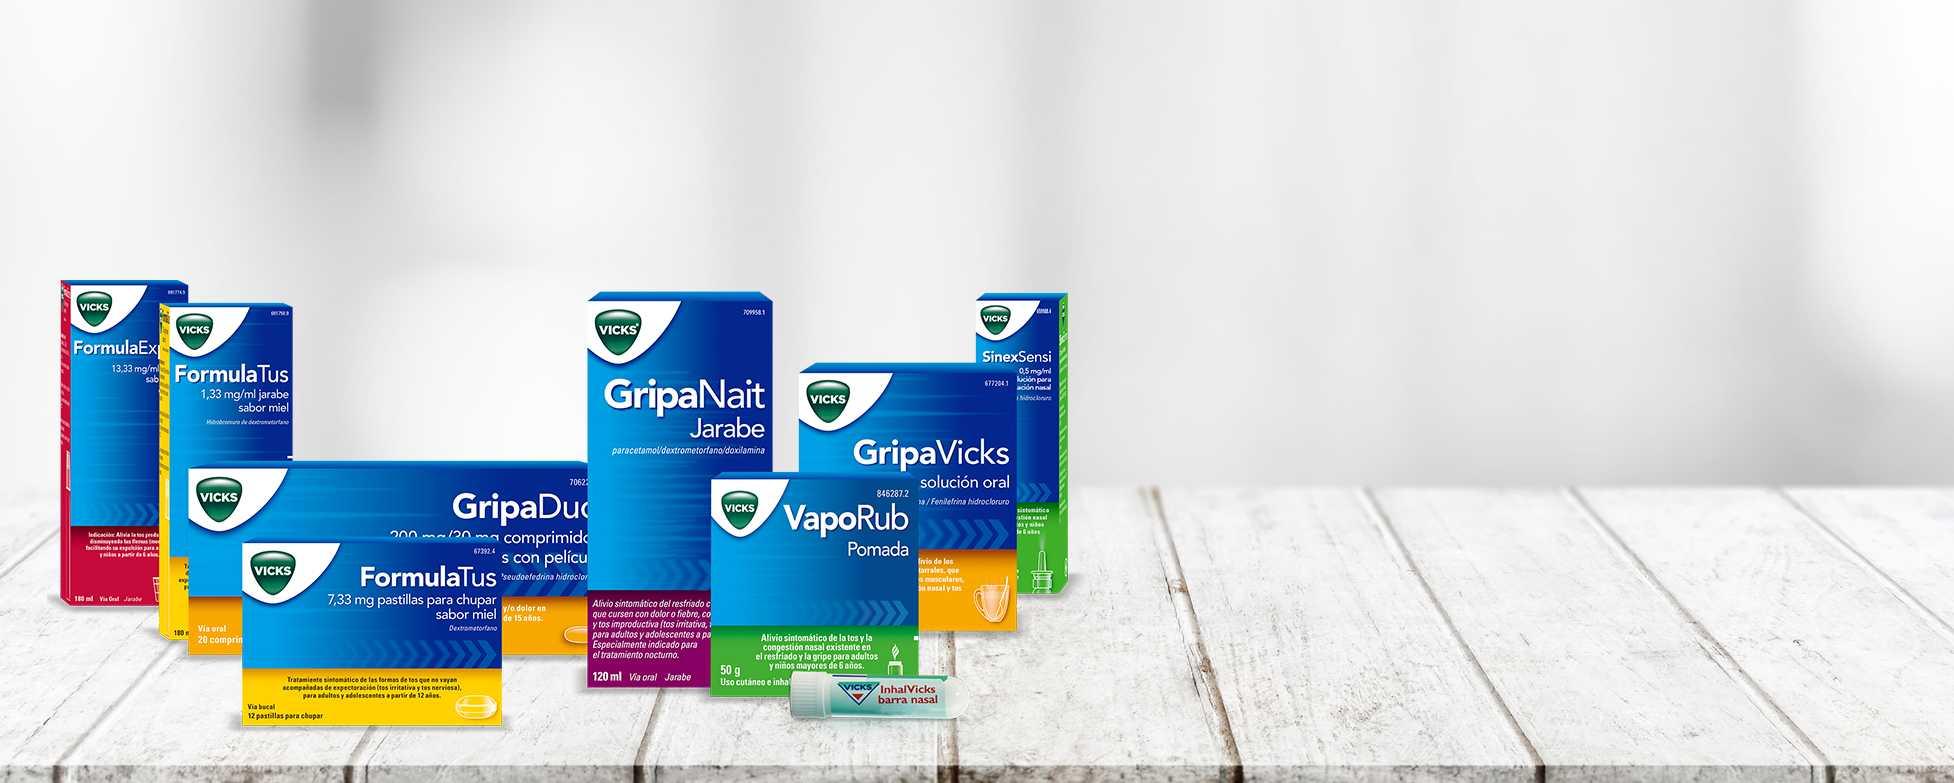 Vicks Vaporub gama de productos en Farma2go